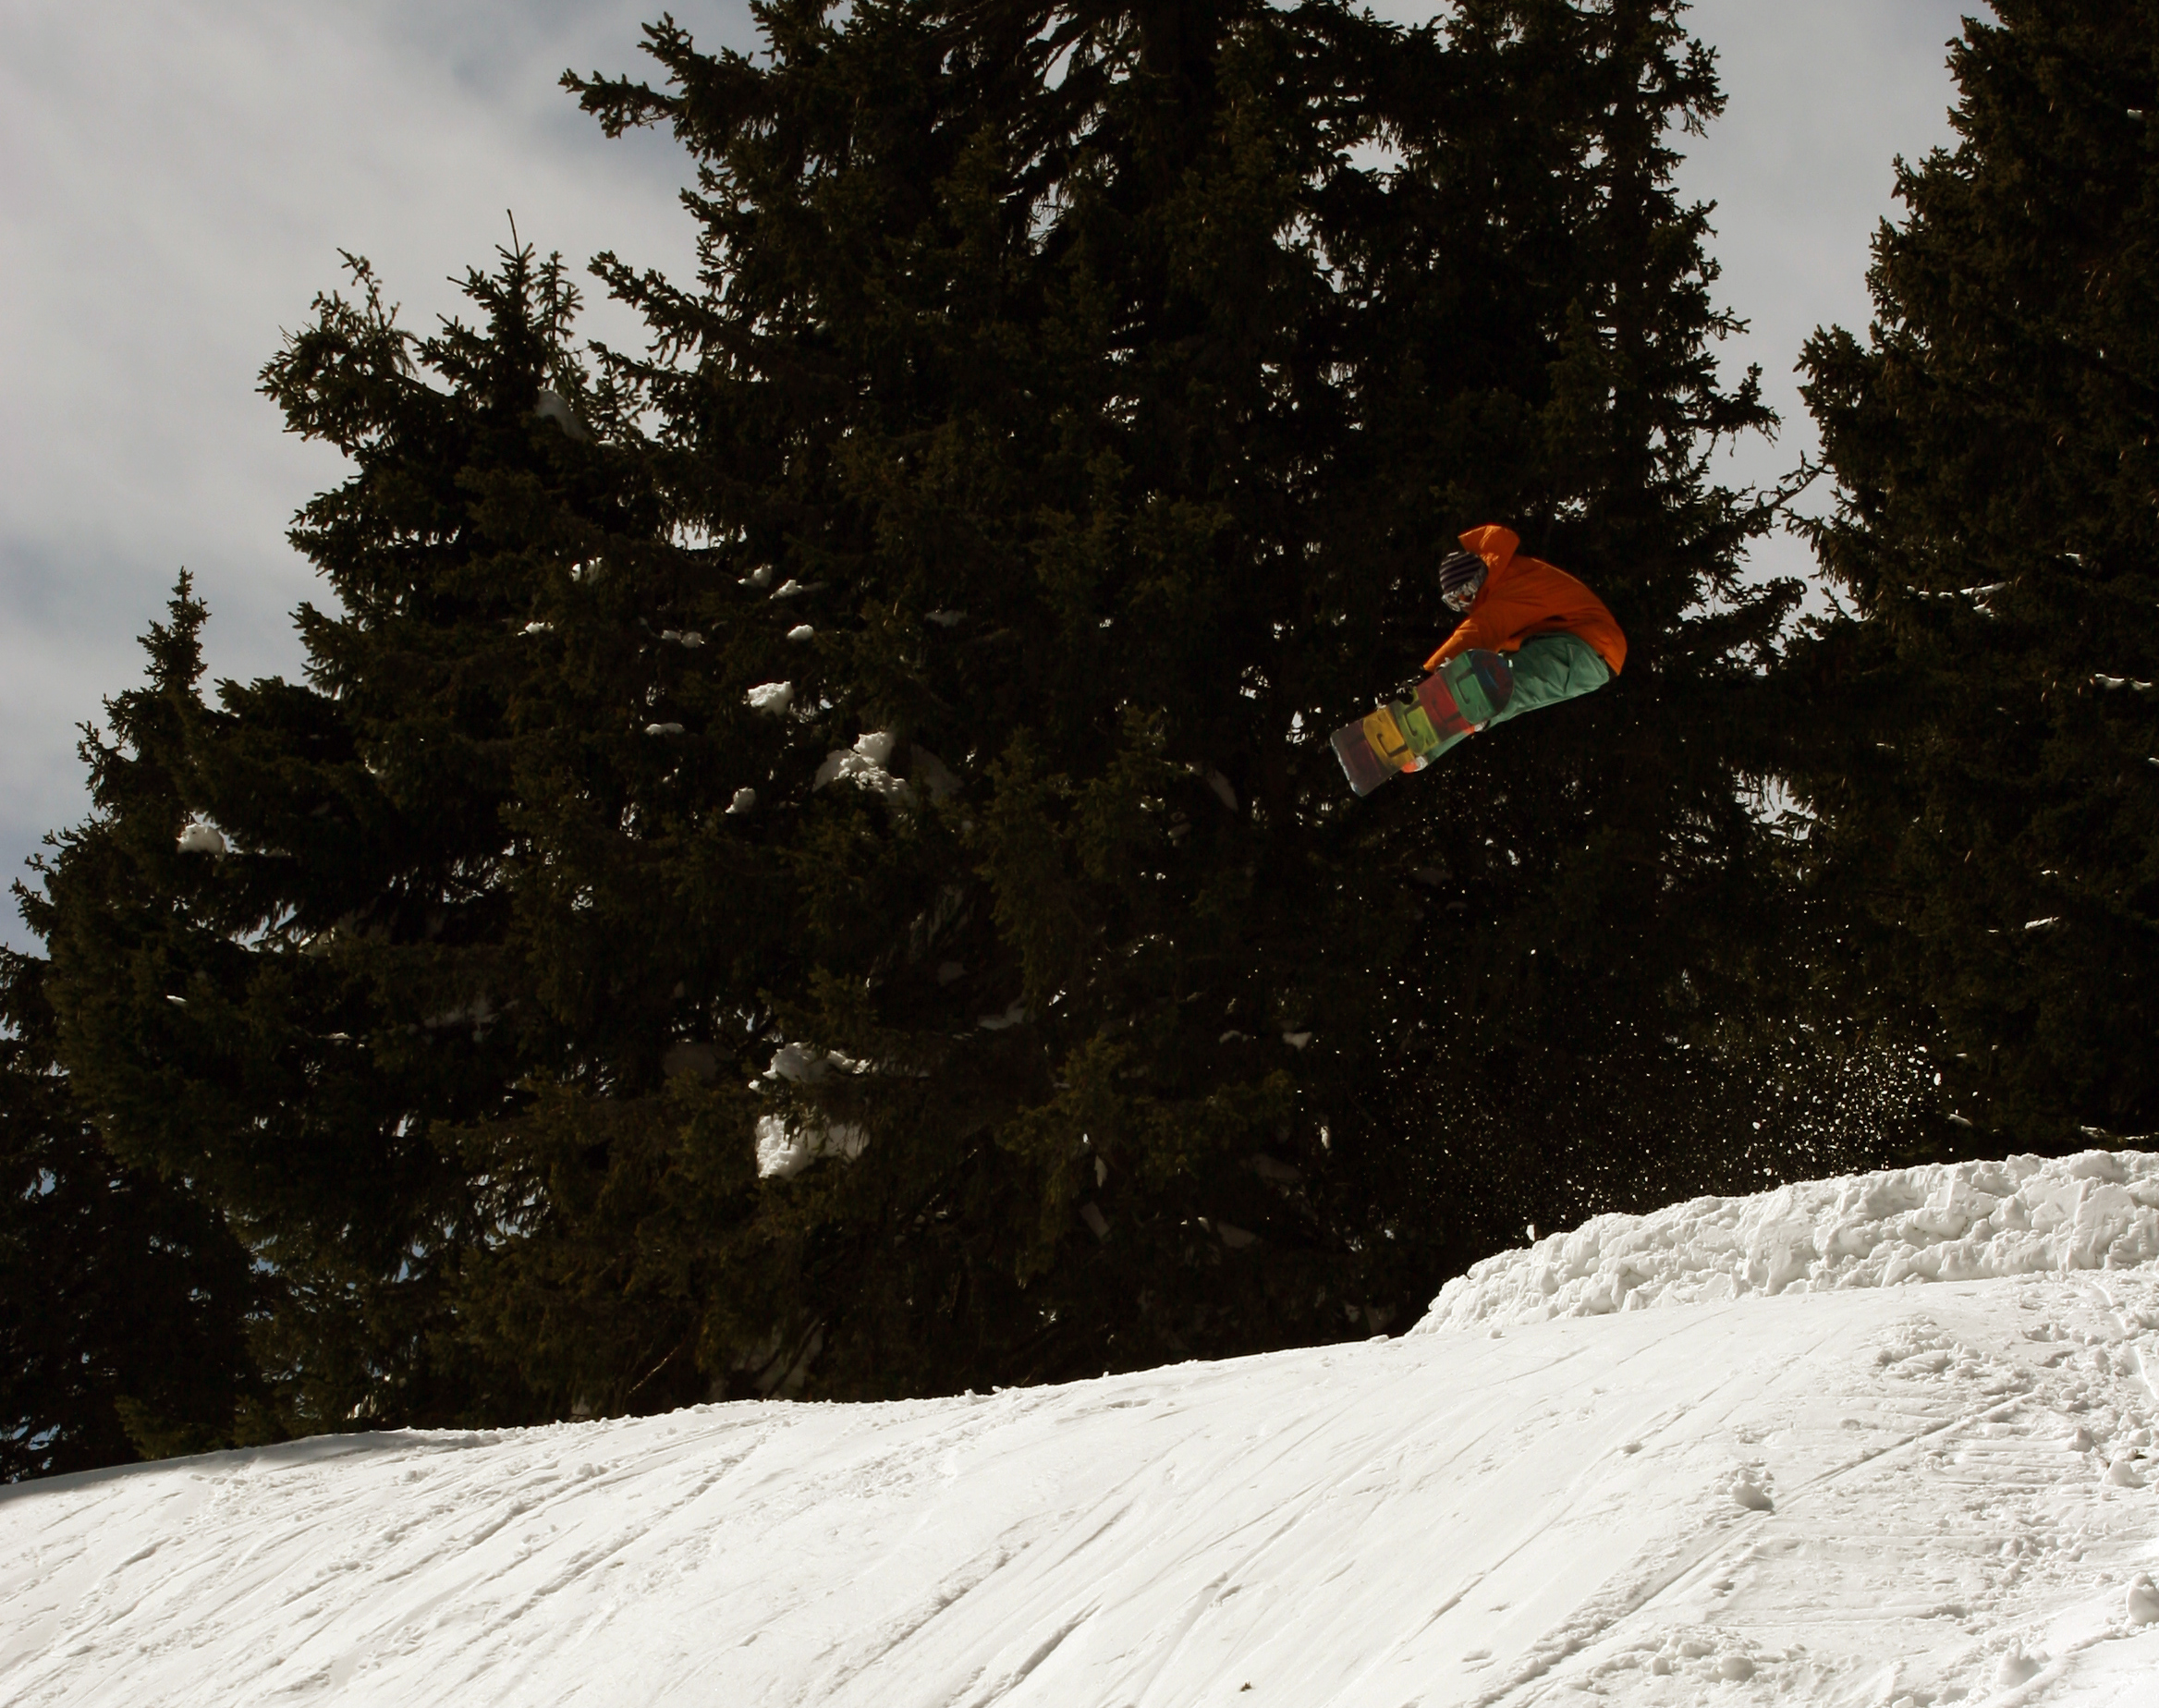 Snowboard stall